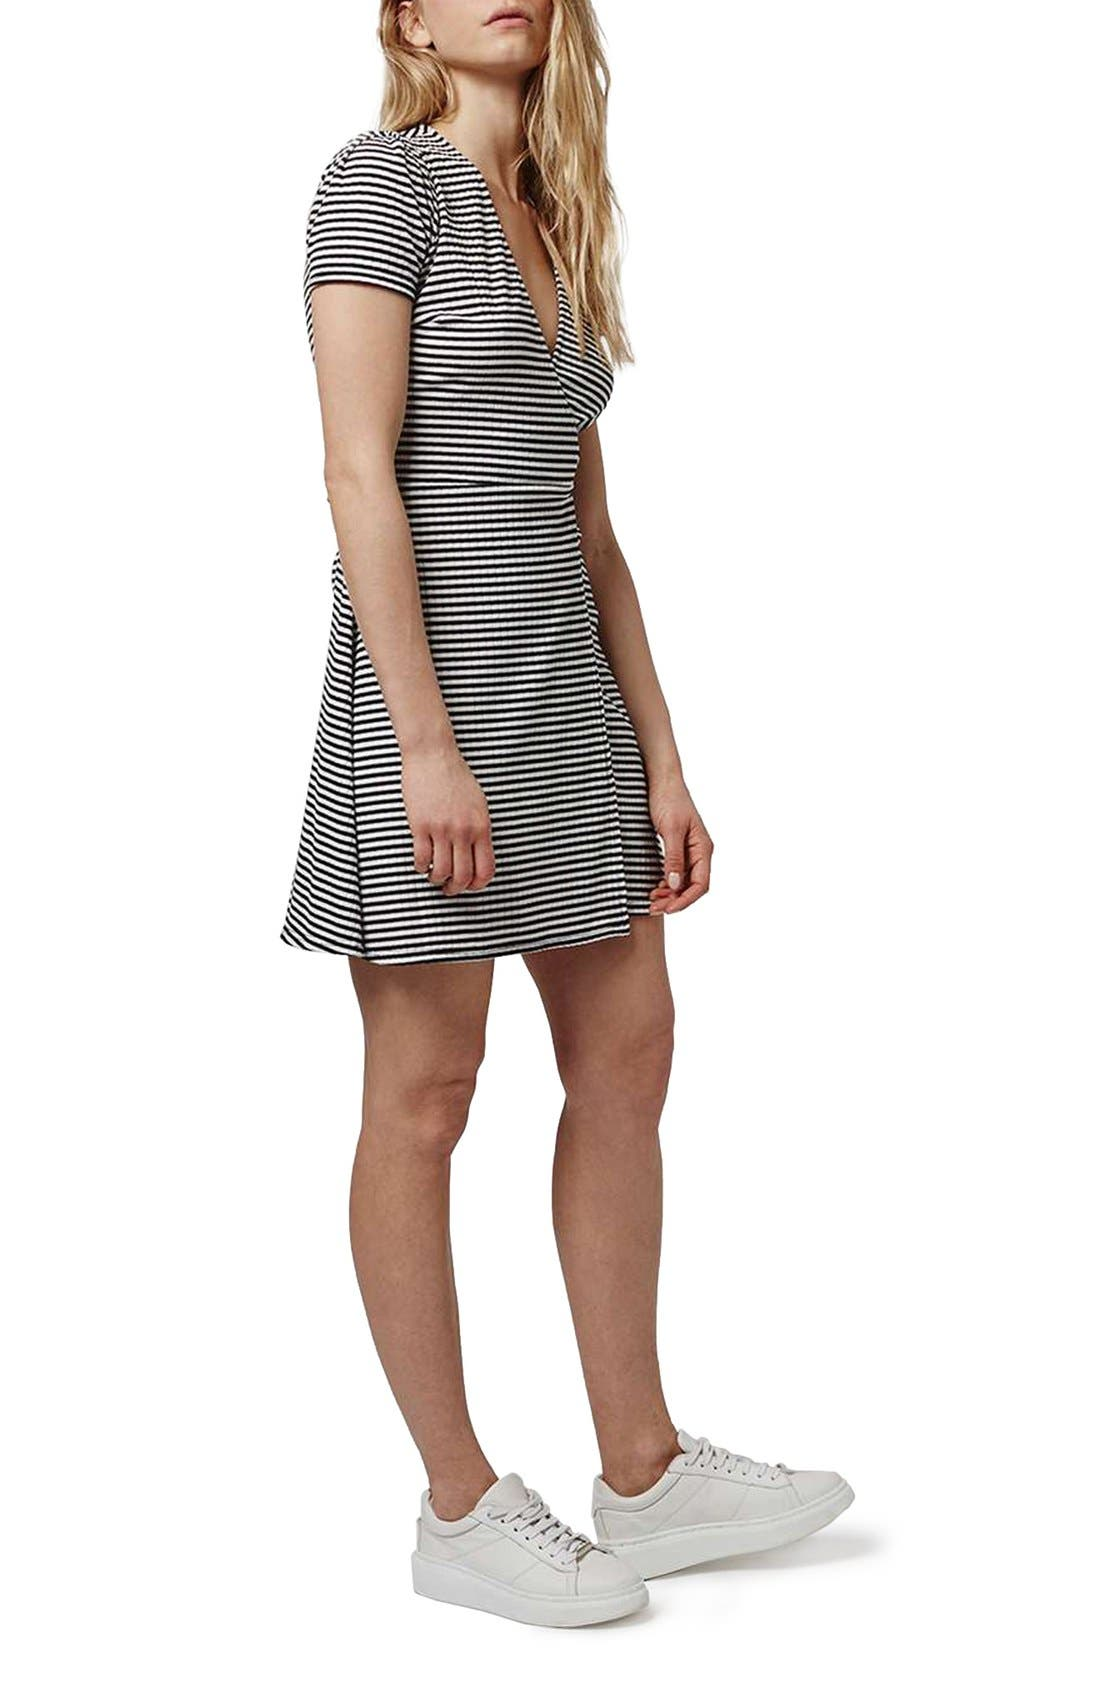 Alternate Image 1 Selected - Topshop Stripe Wrap Skater Dress